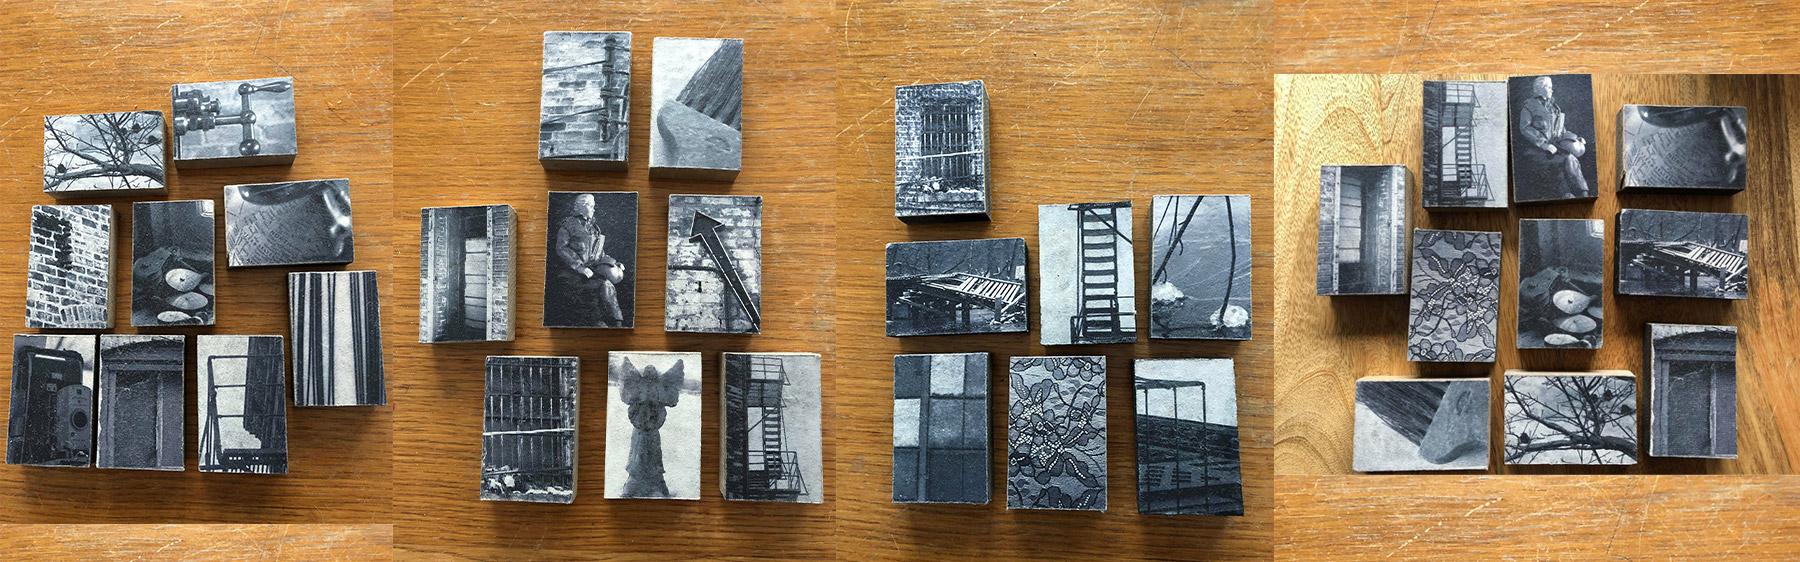 New Black and White Photo Art Blocks by Jane Erlandson